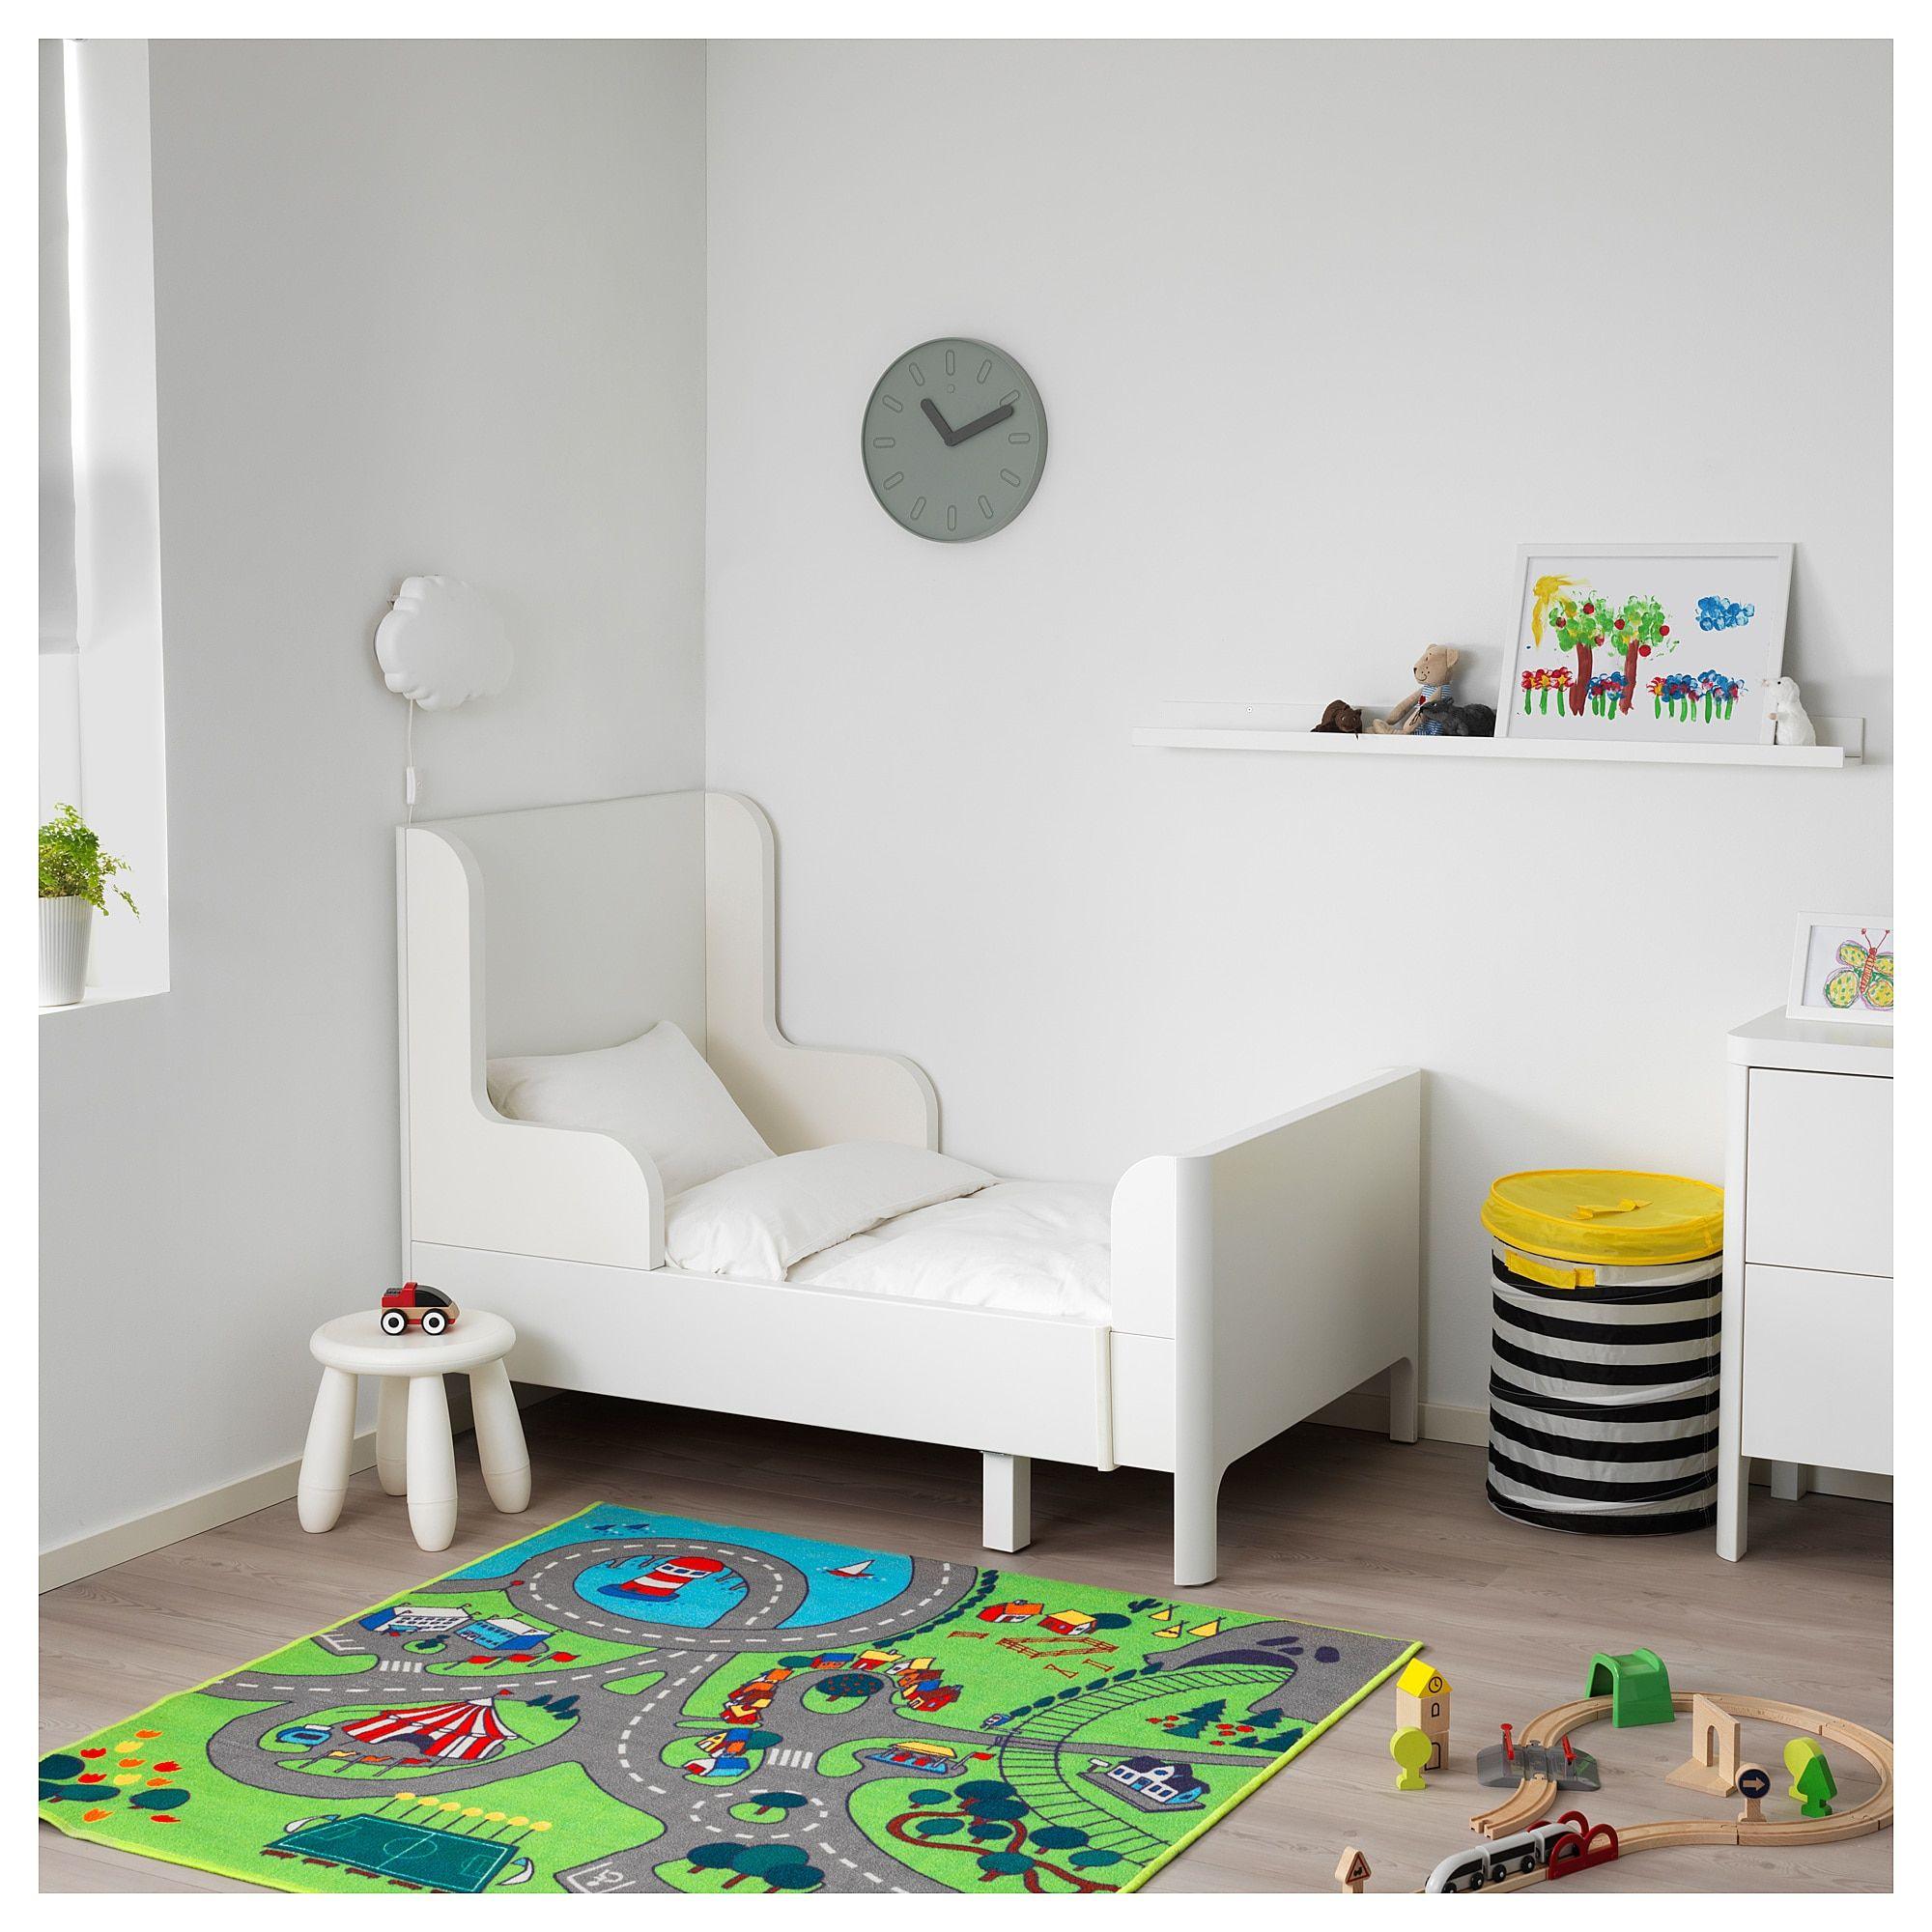 IKEA - BUSUNGE Extendable bed white | Ikea kids bed, Ikea ...